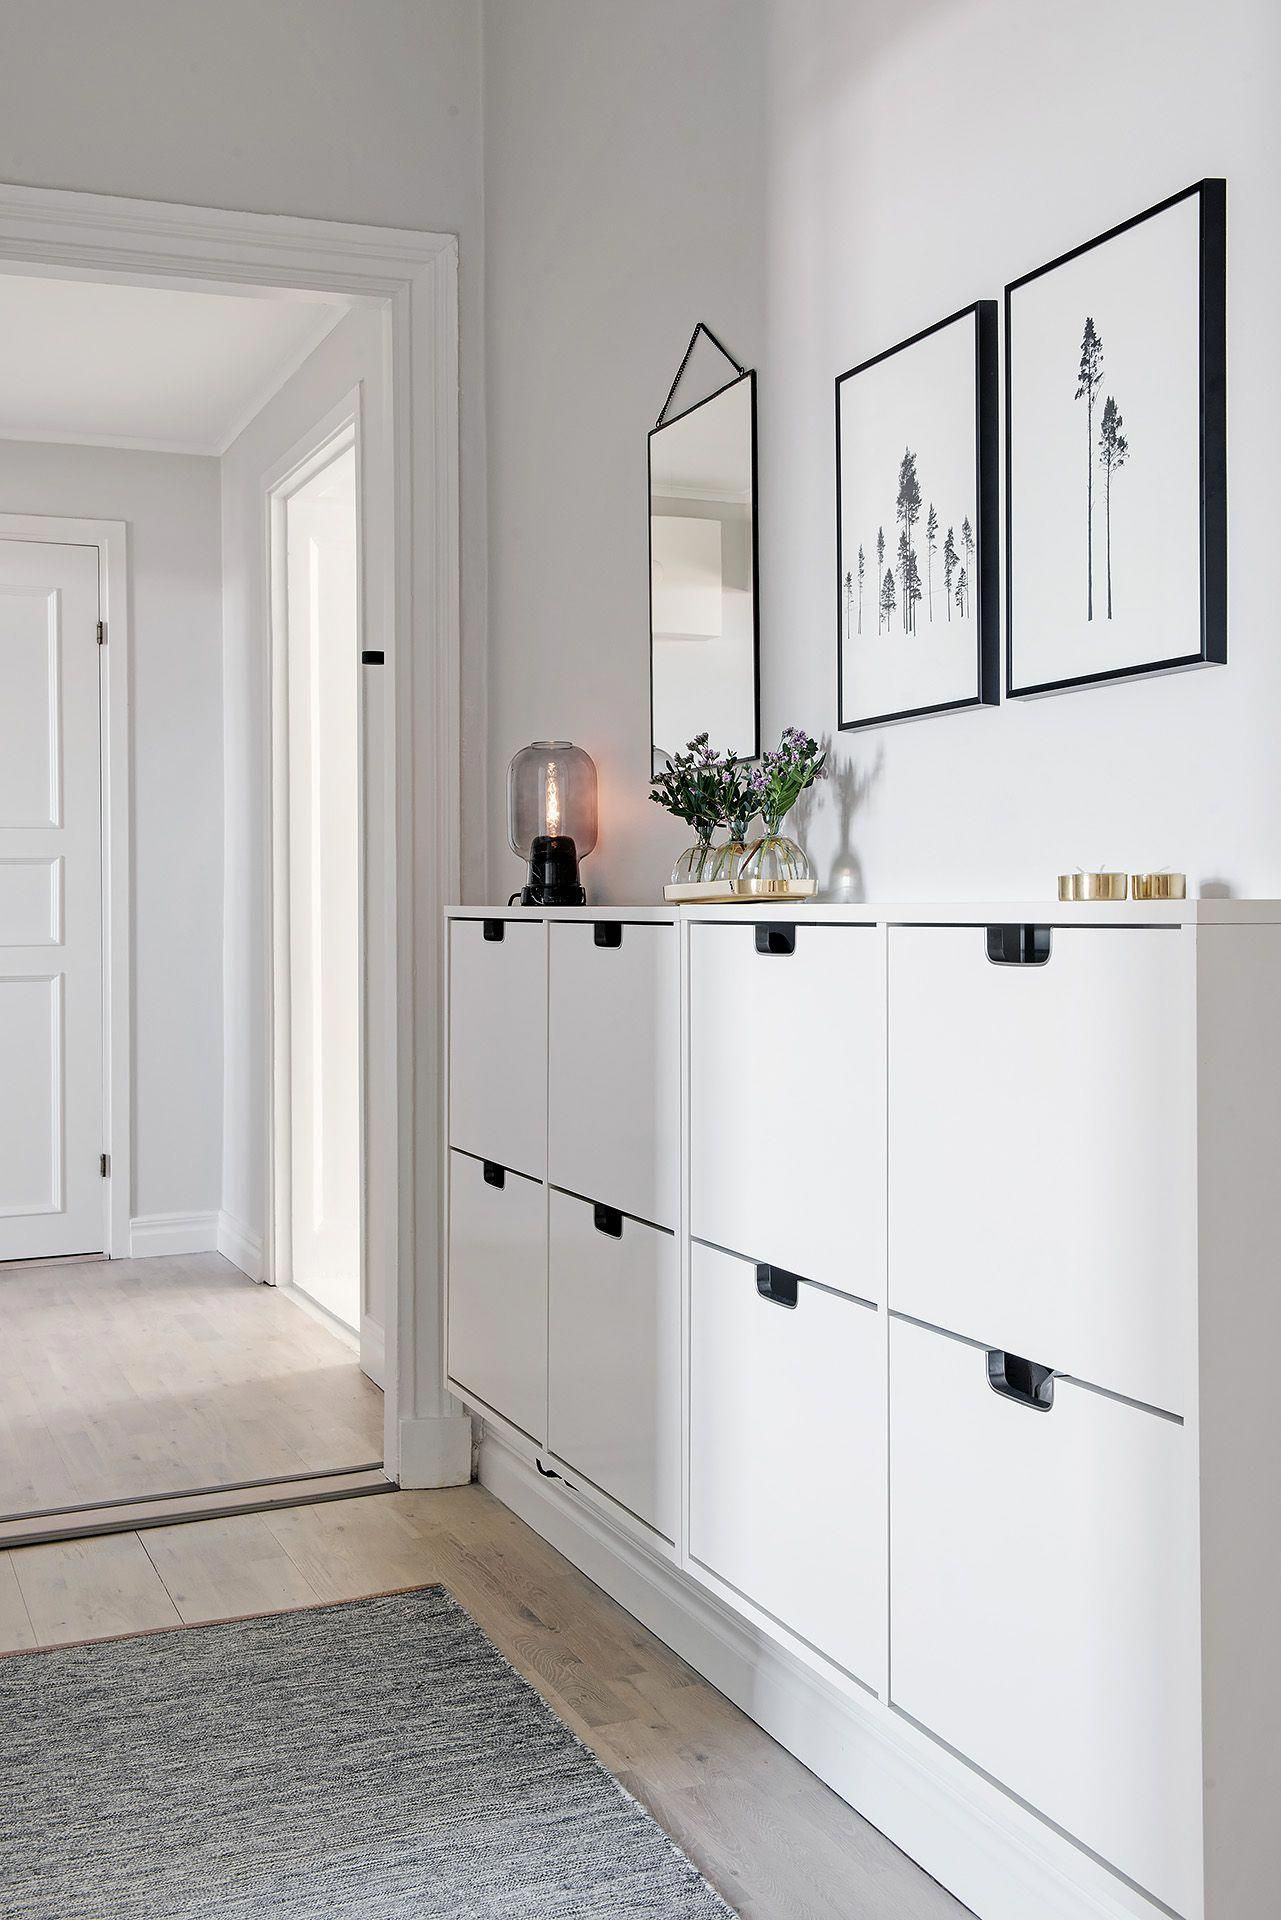 Ikea Stall Shoe Cabinet Hallwayideas Idee Deco Entree Maison Decorer Entree Maison Deco Entree Maison